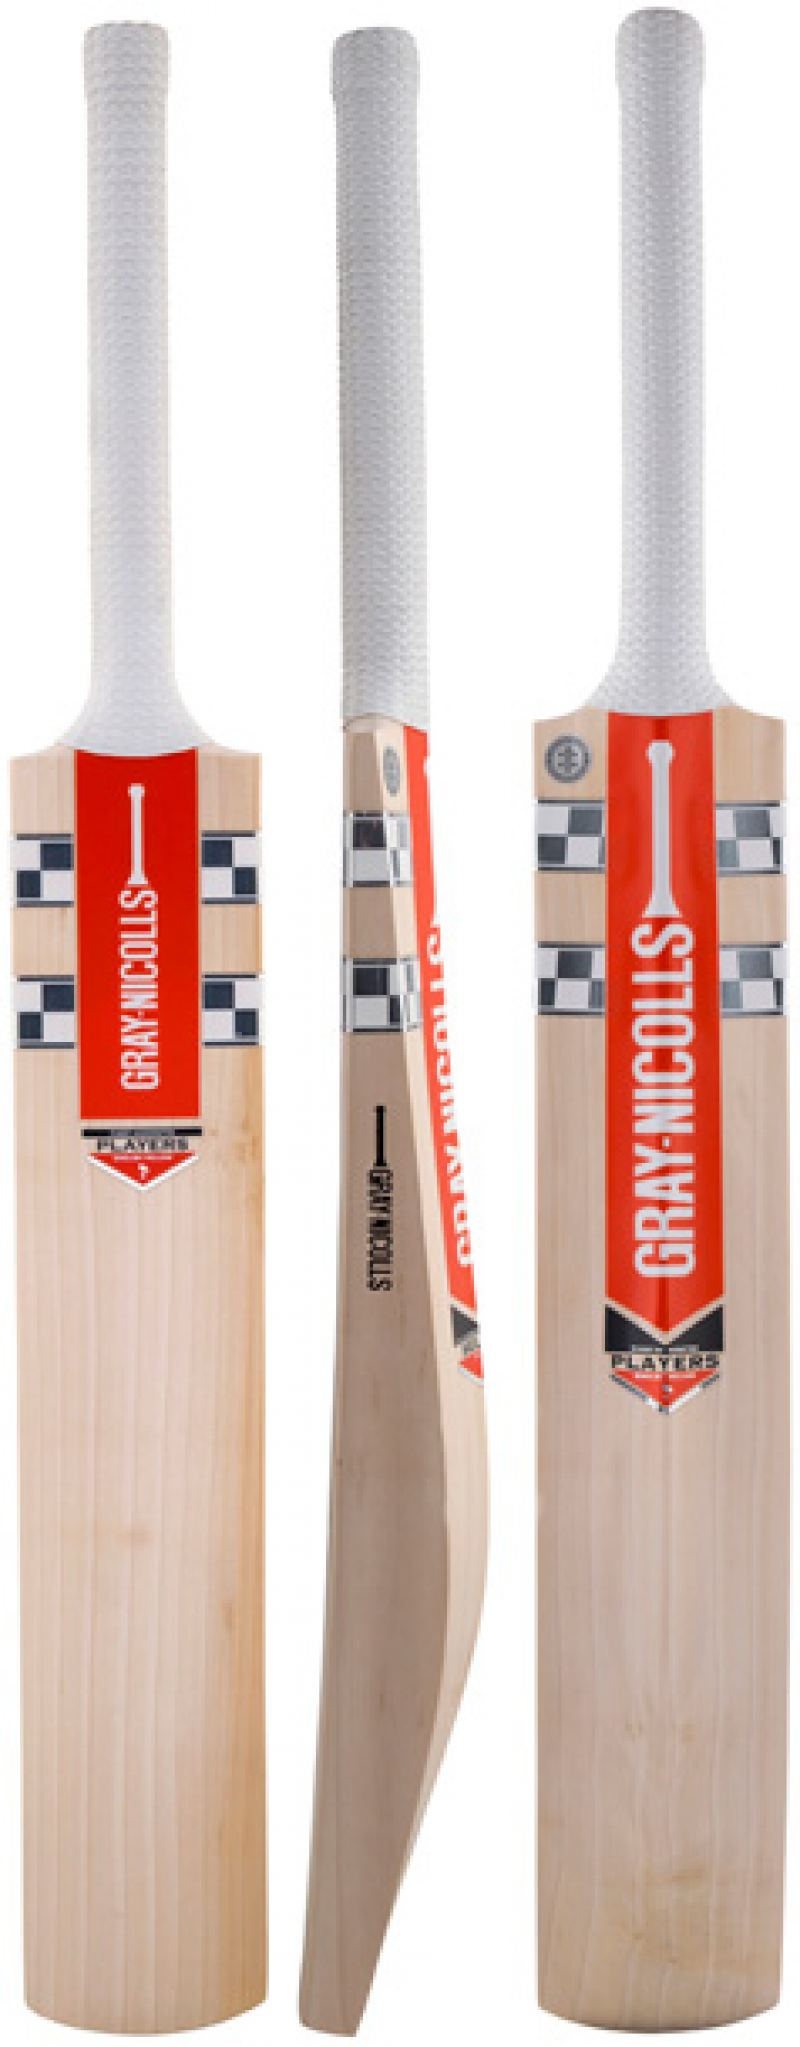 Gray Nicolls GN Players Cricket Bat